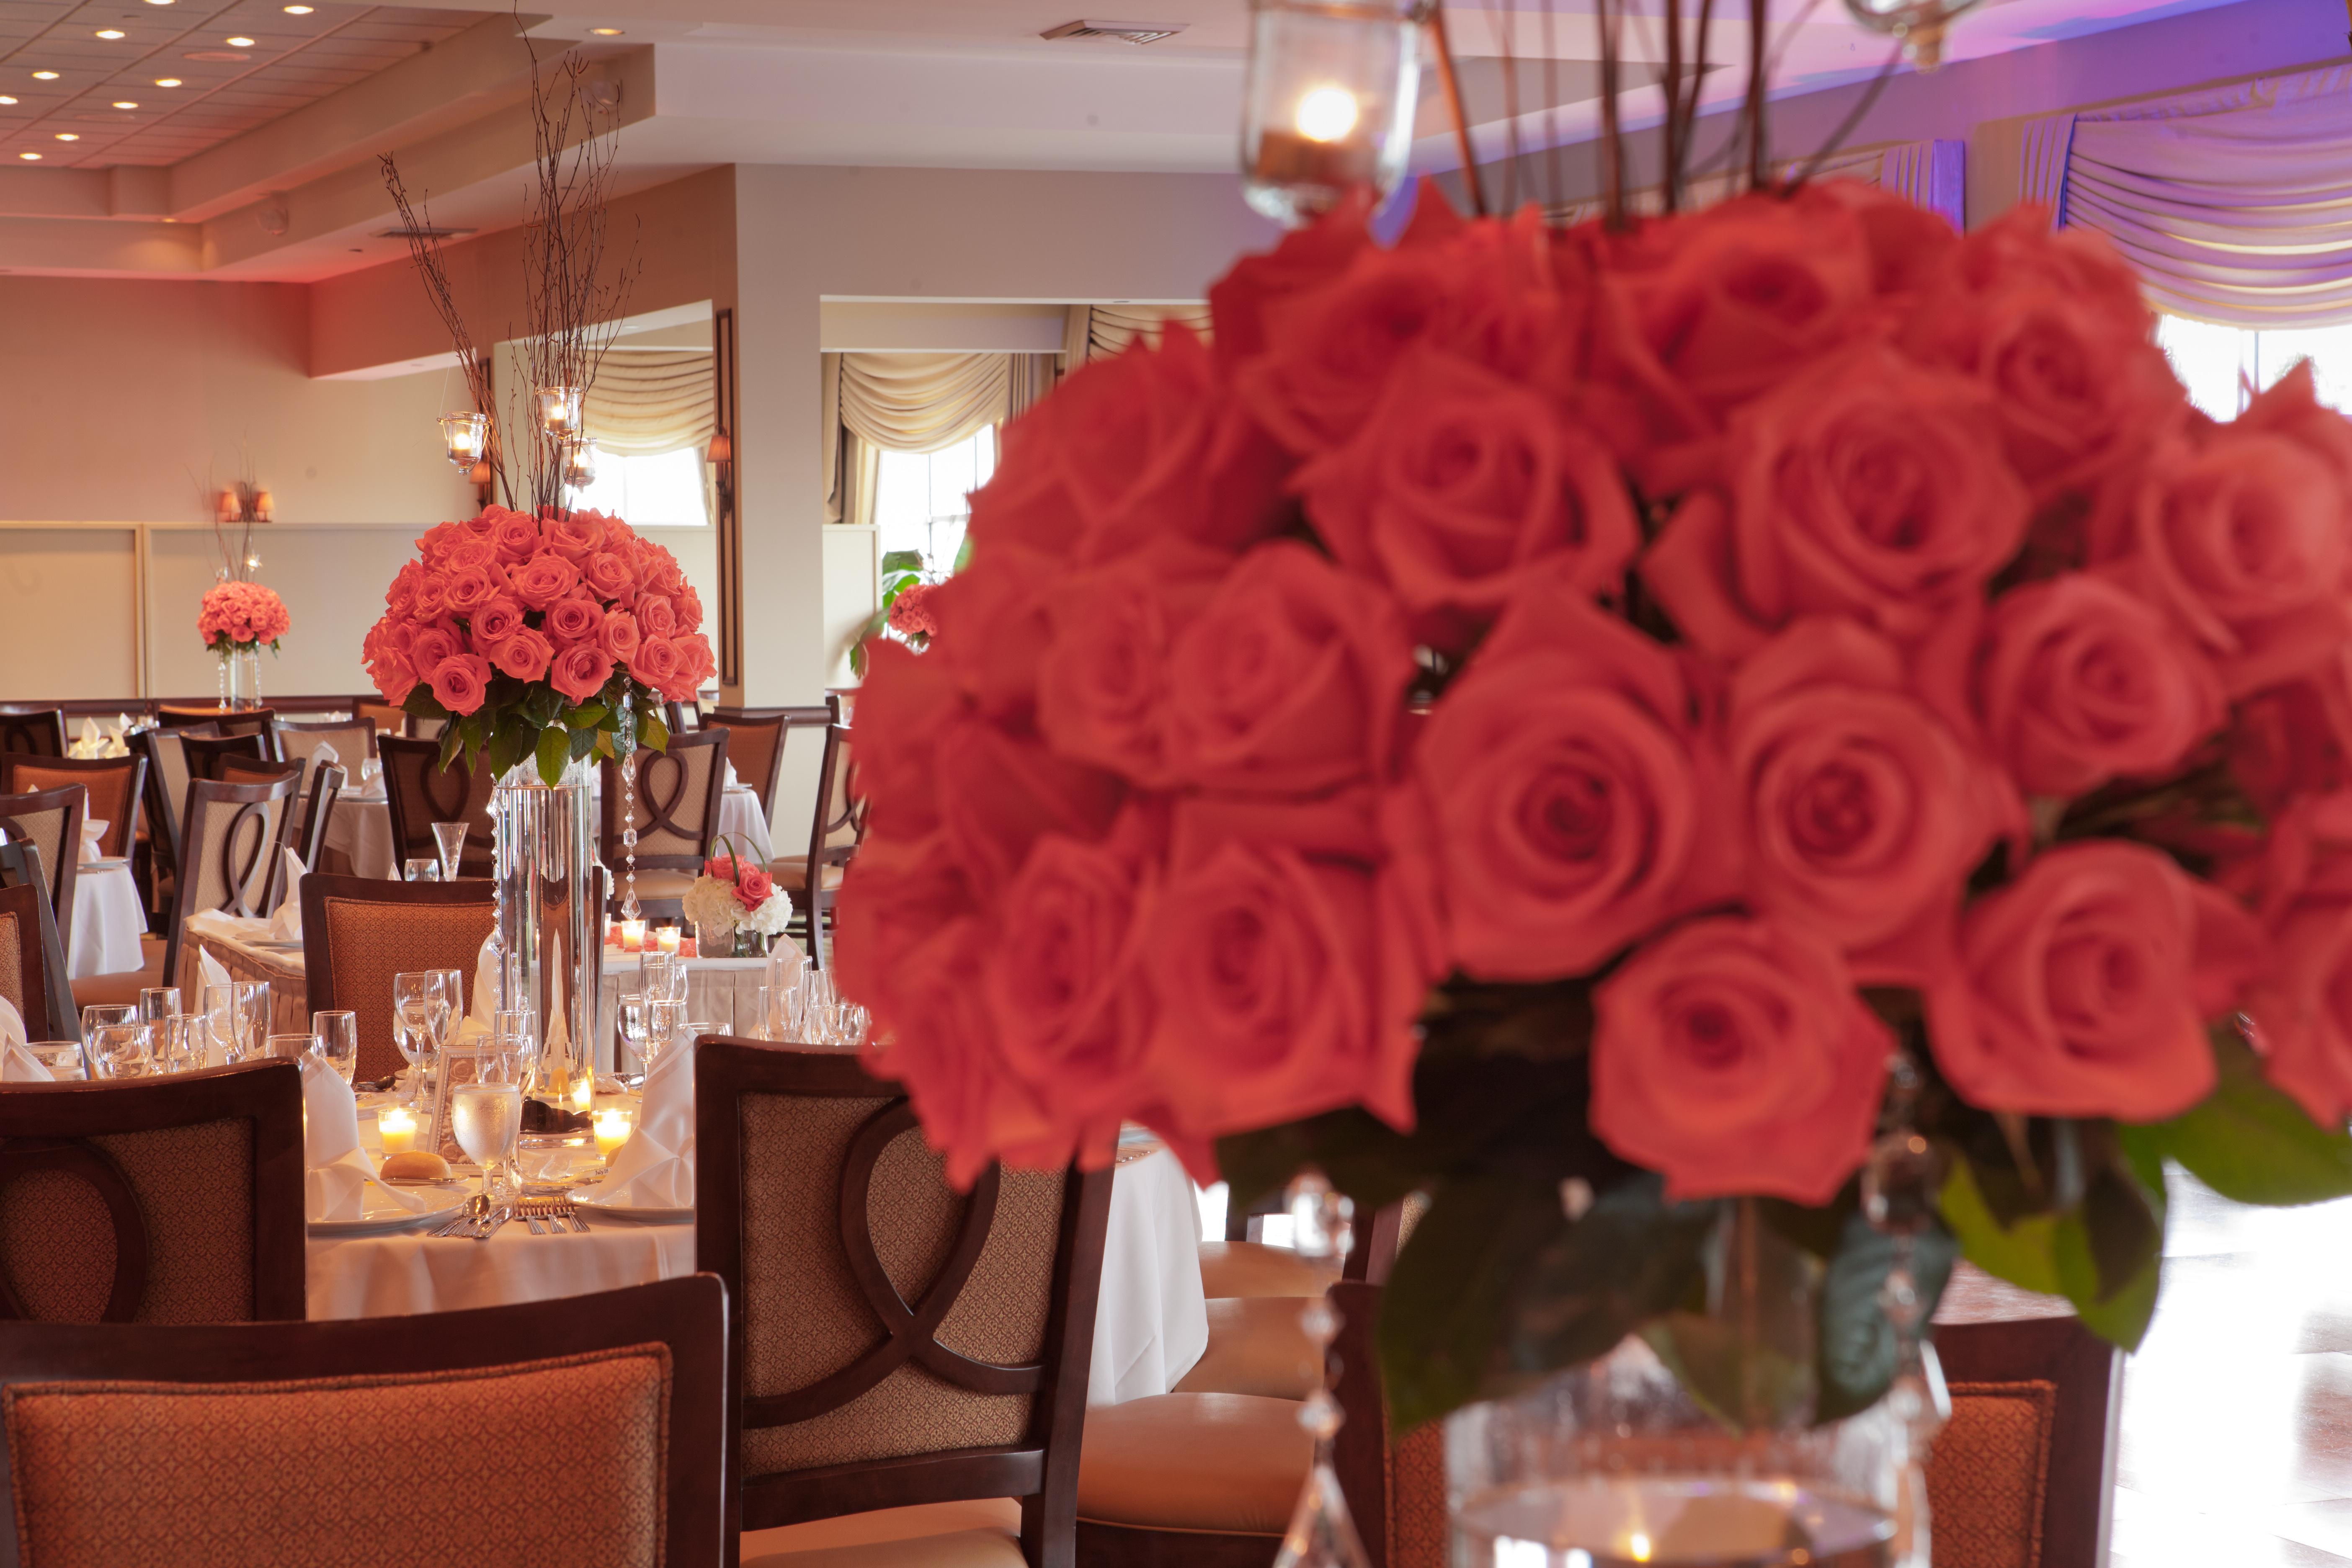 November gerilyn gianna event floral design